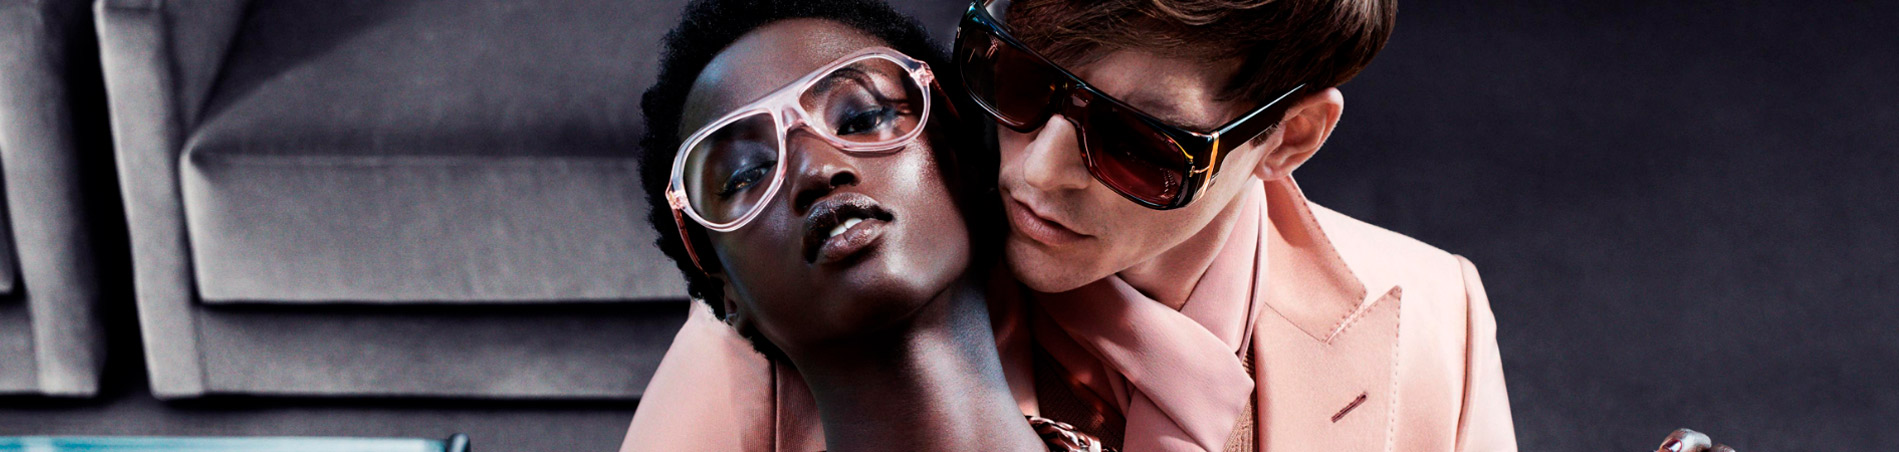 Gafas de sol del diseñador Tom Ford